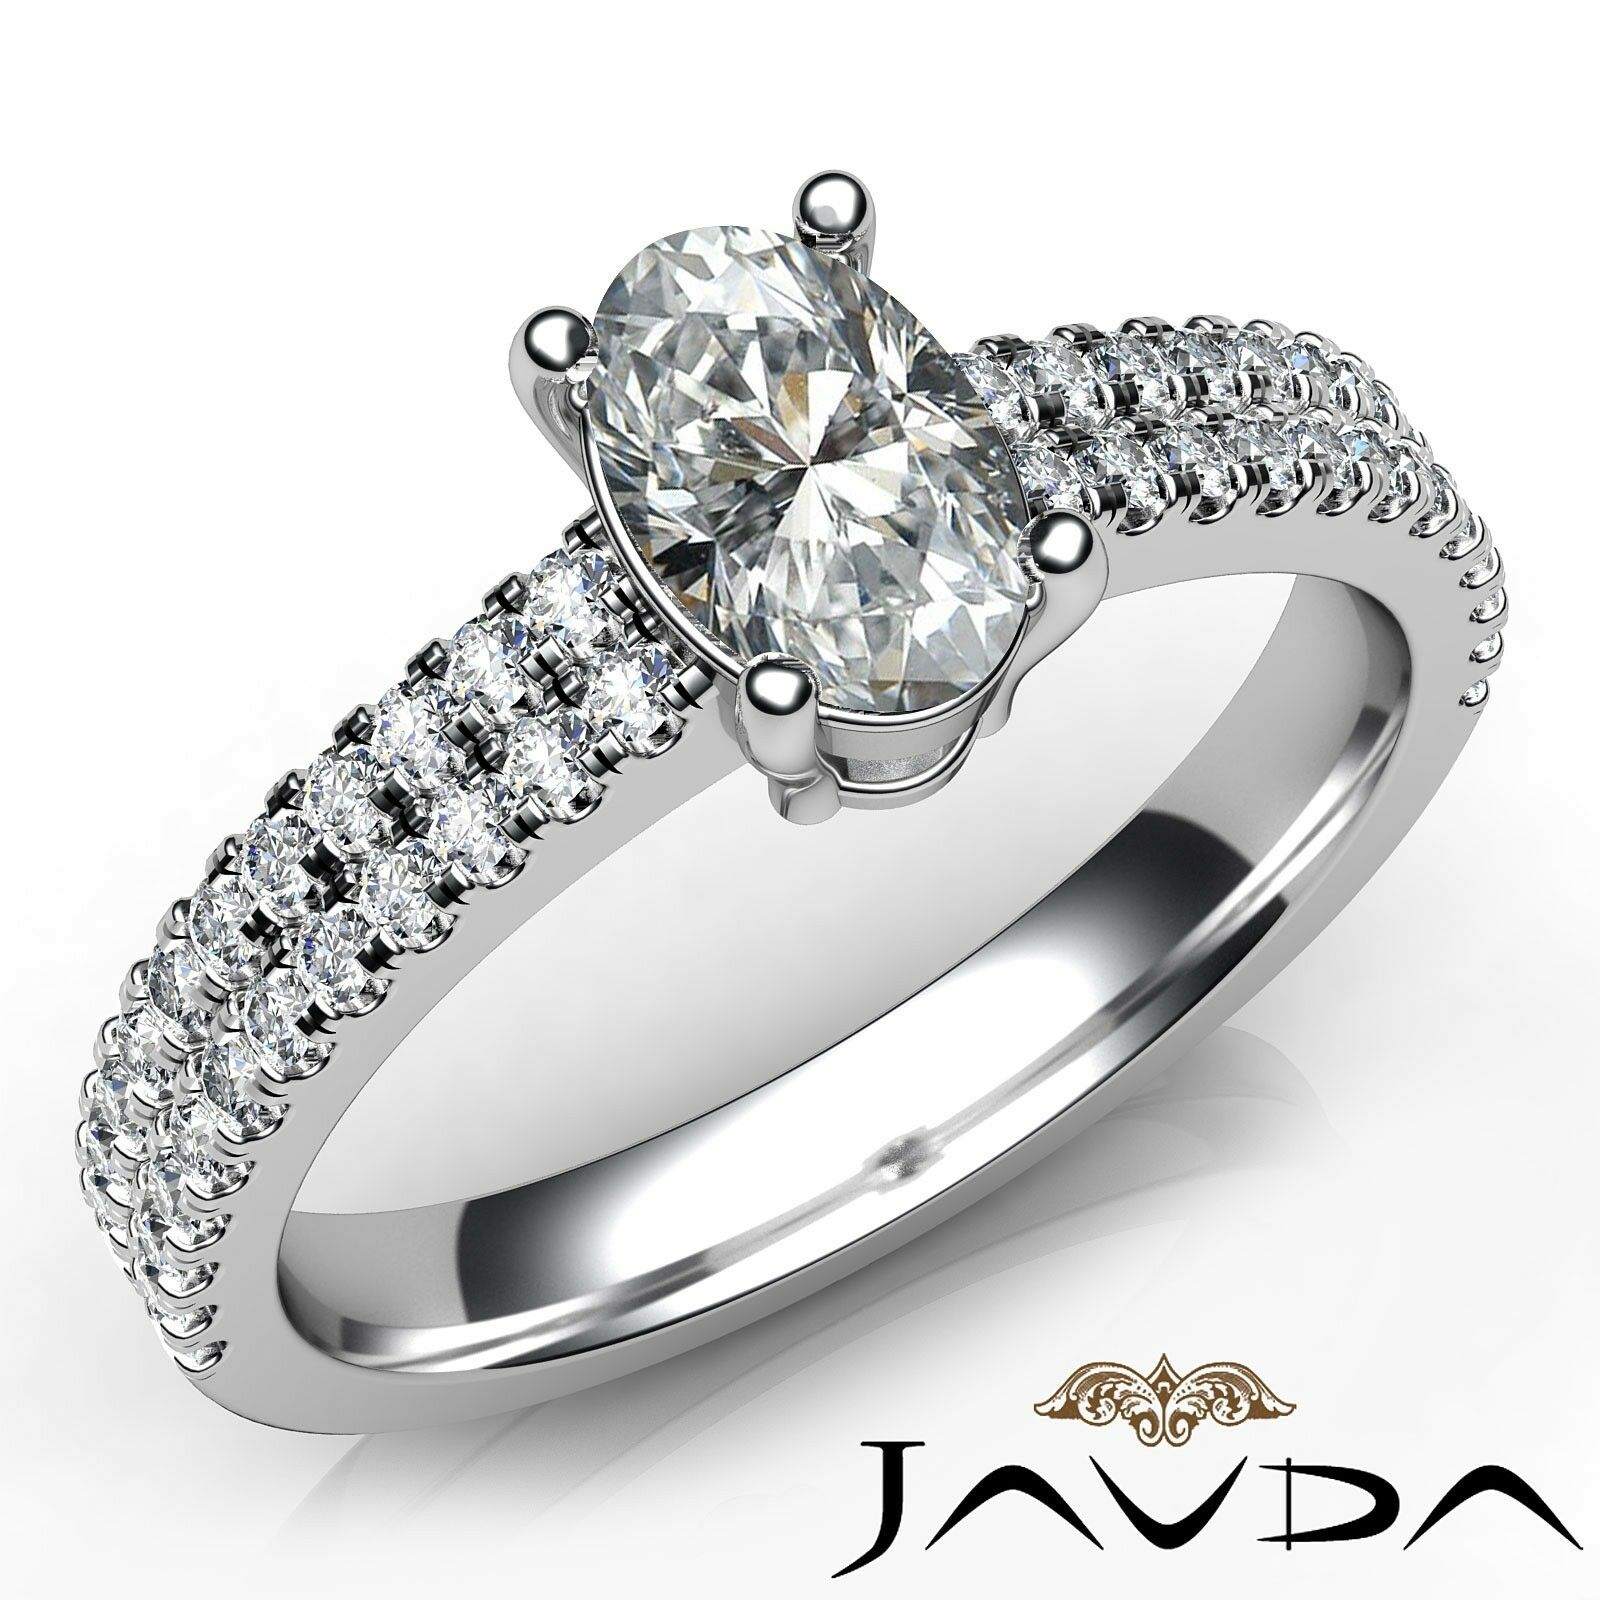 1.02ctw Prong Setting Oval Diamond Engagement Ring GIA J-VVS2 White Gold Rings